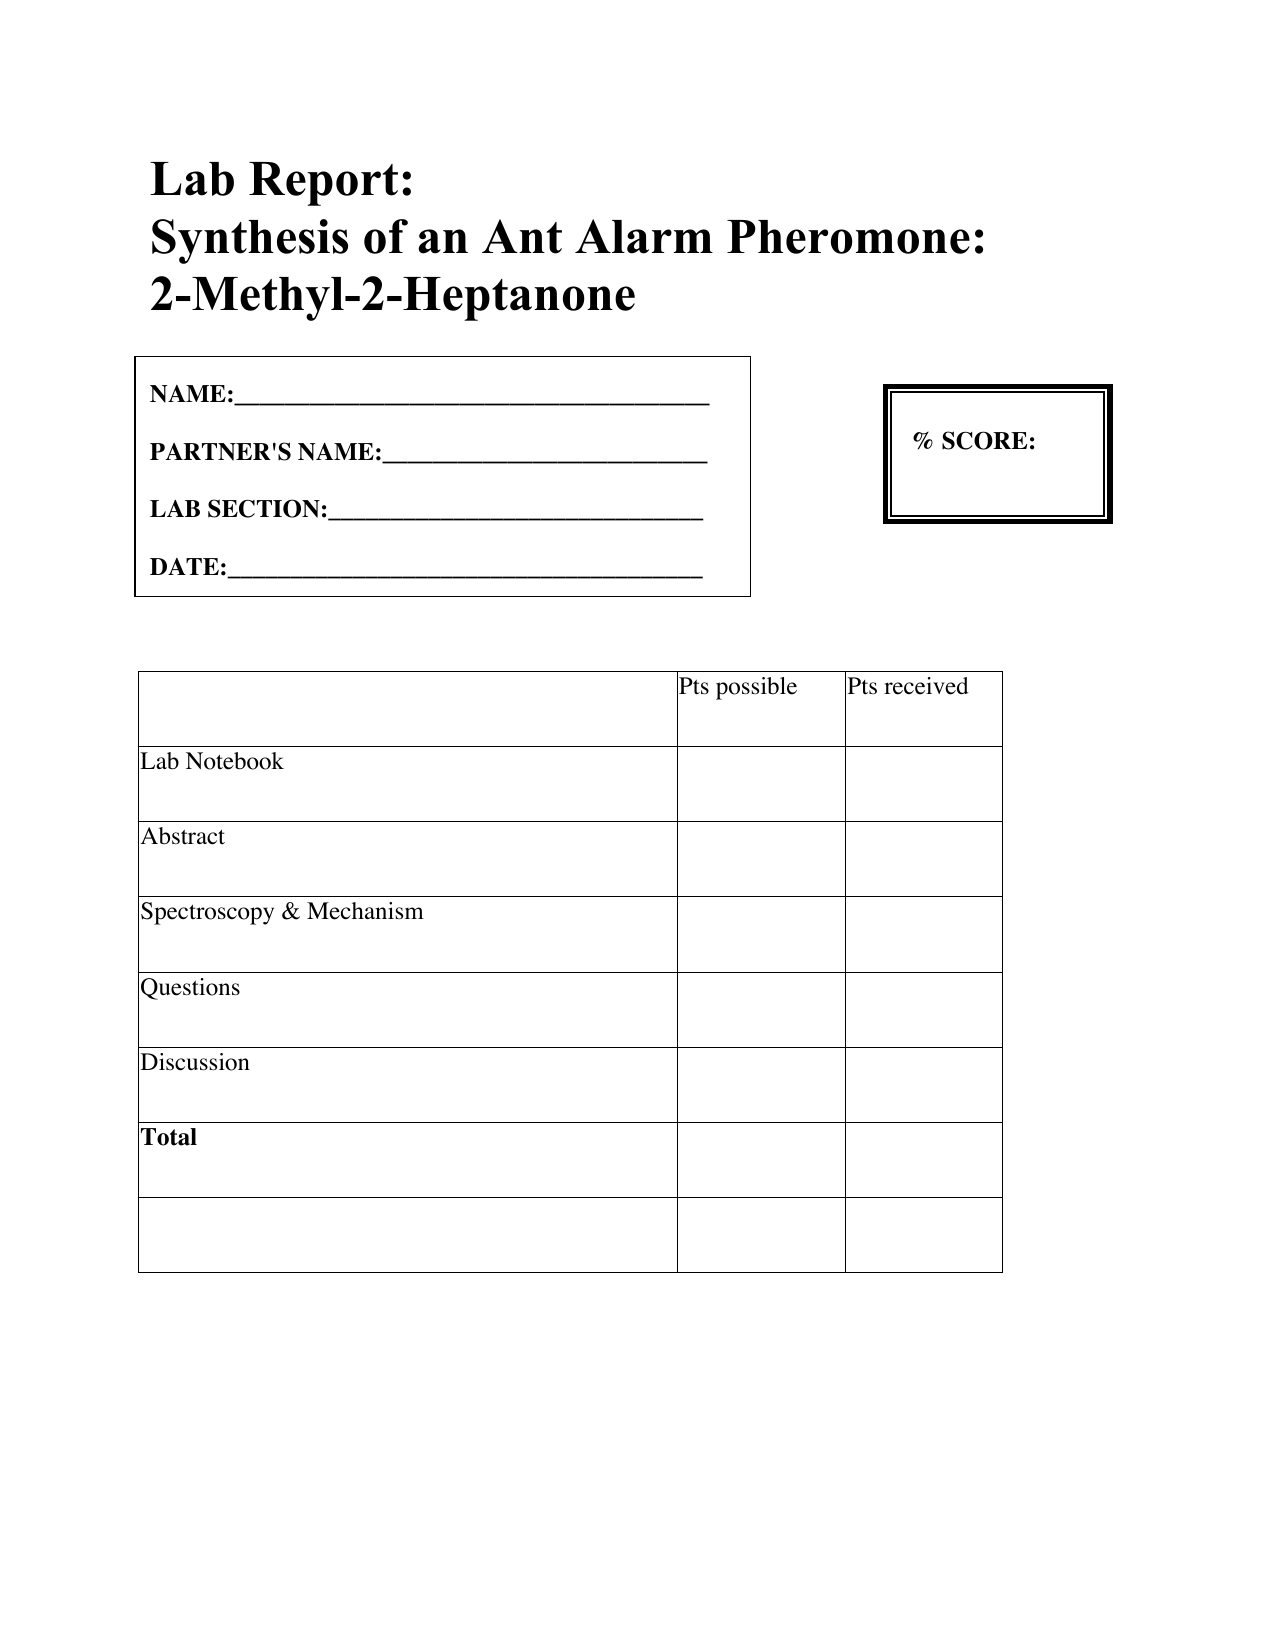 Lab Report Synthesis Of An Ant Alarm Pheromone 2 Methyl Heptanone